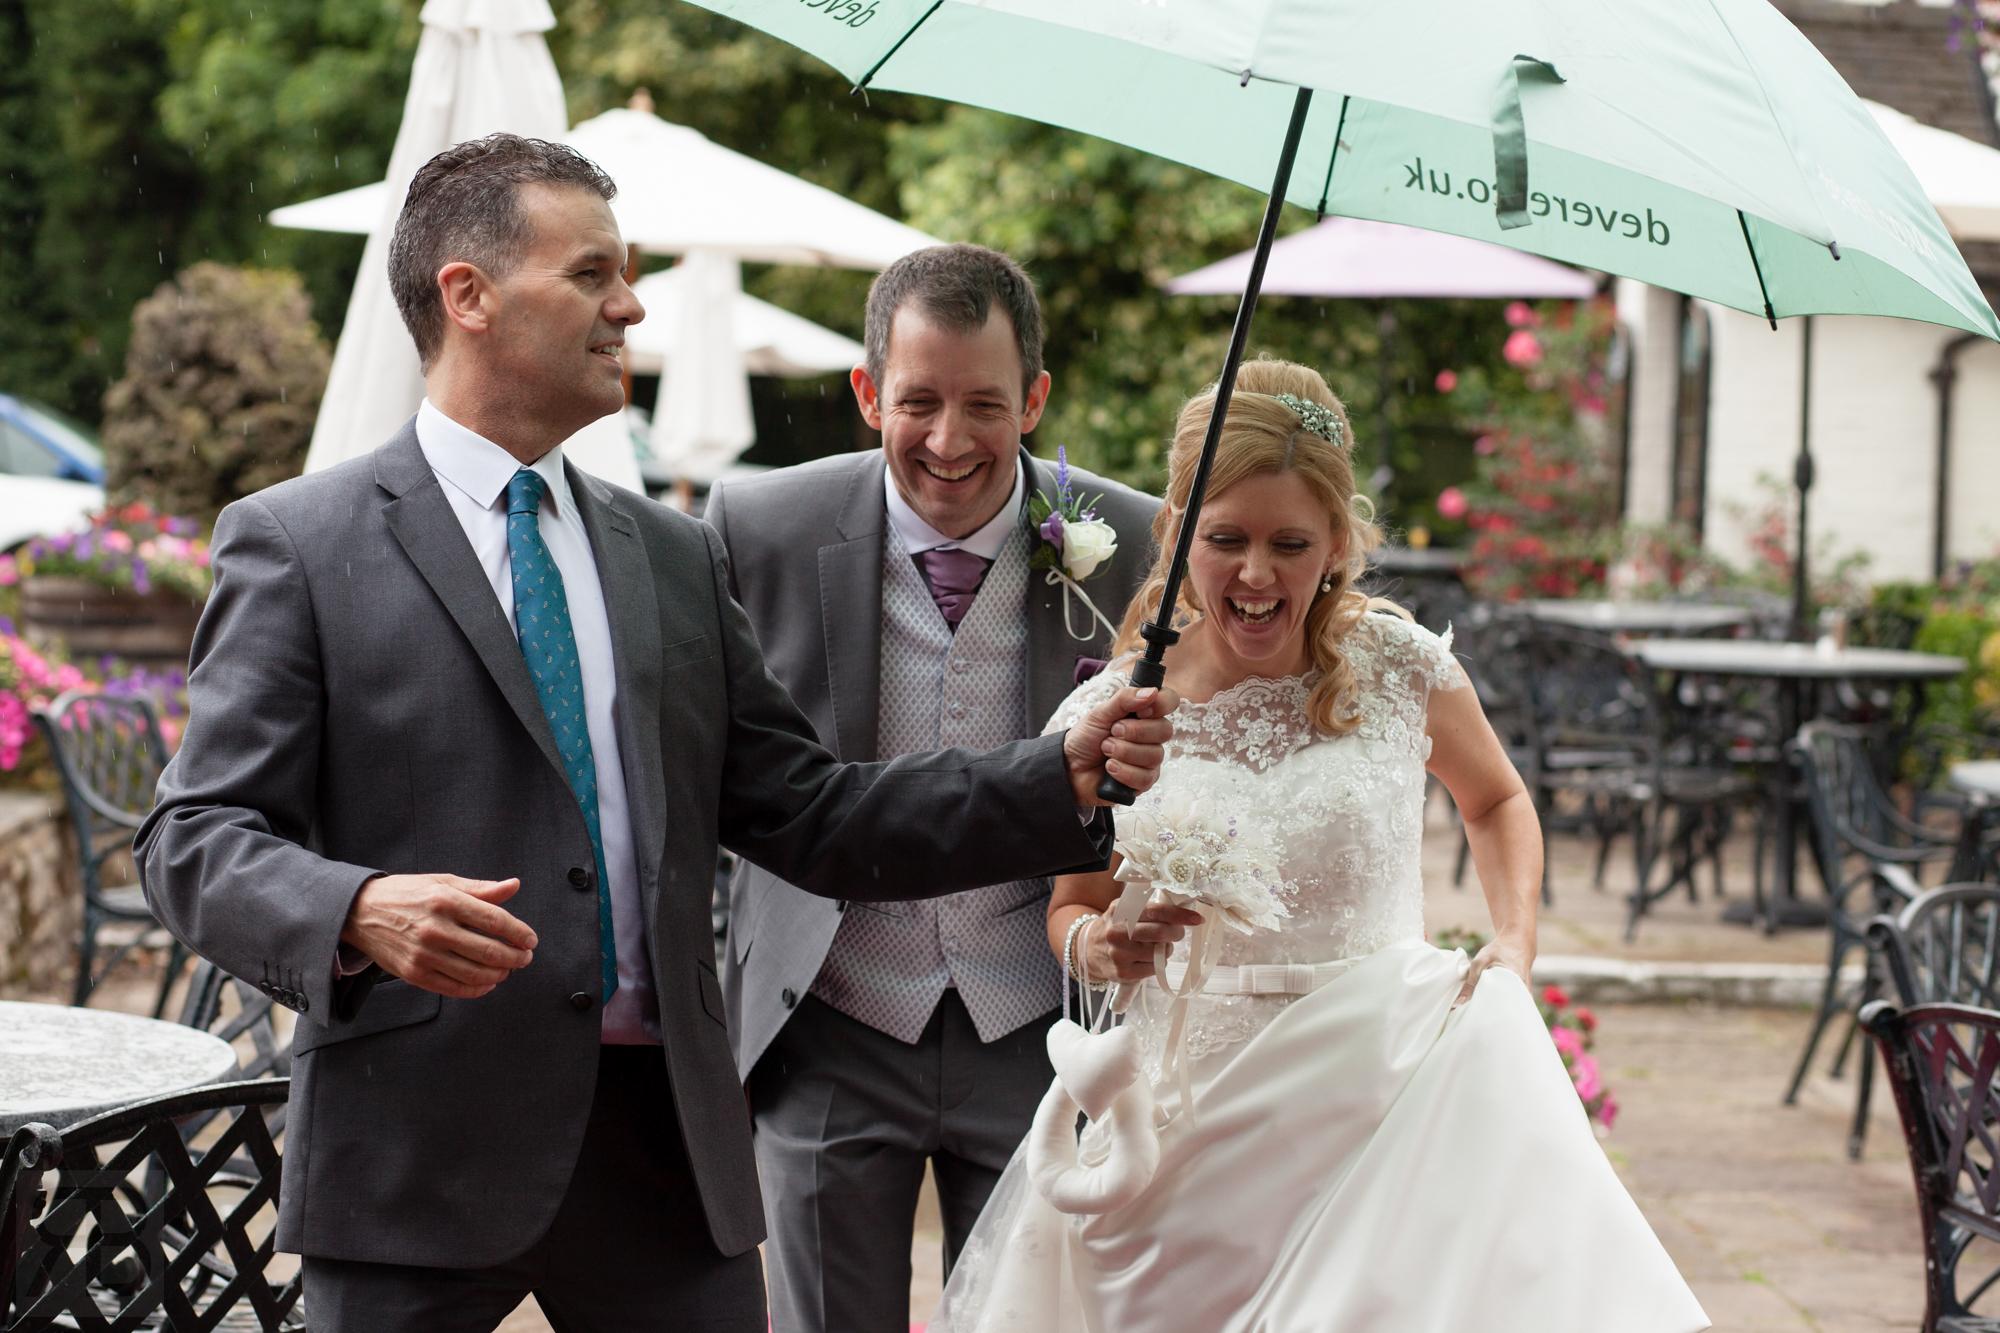 110715_LisaCraigJohnson_Wedding_5923515_WebWM.jpg